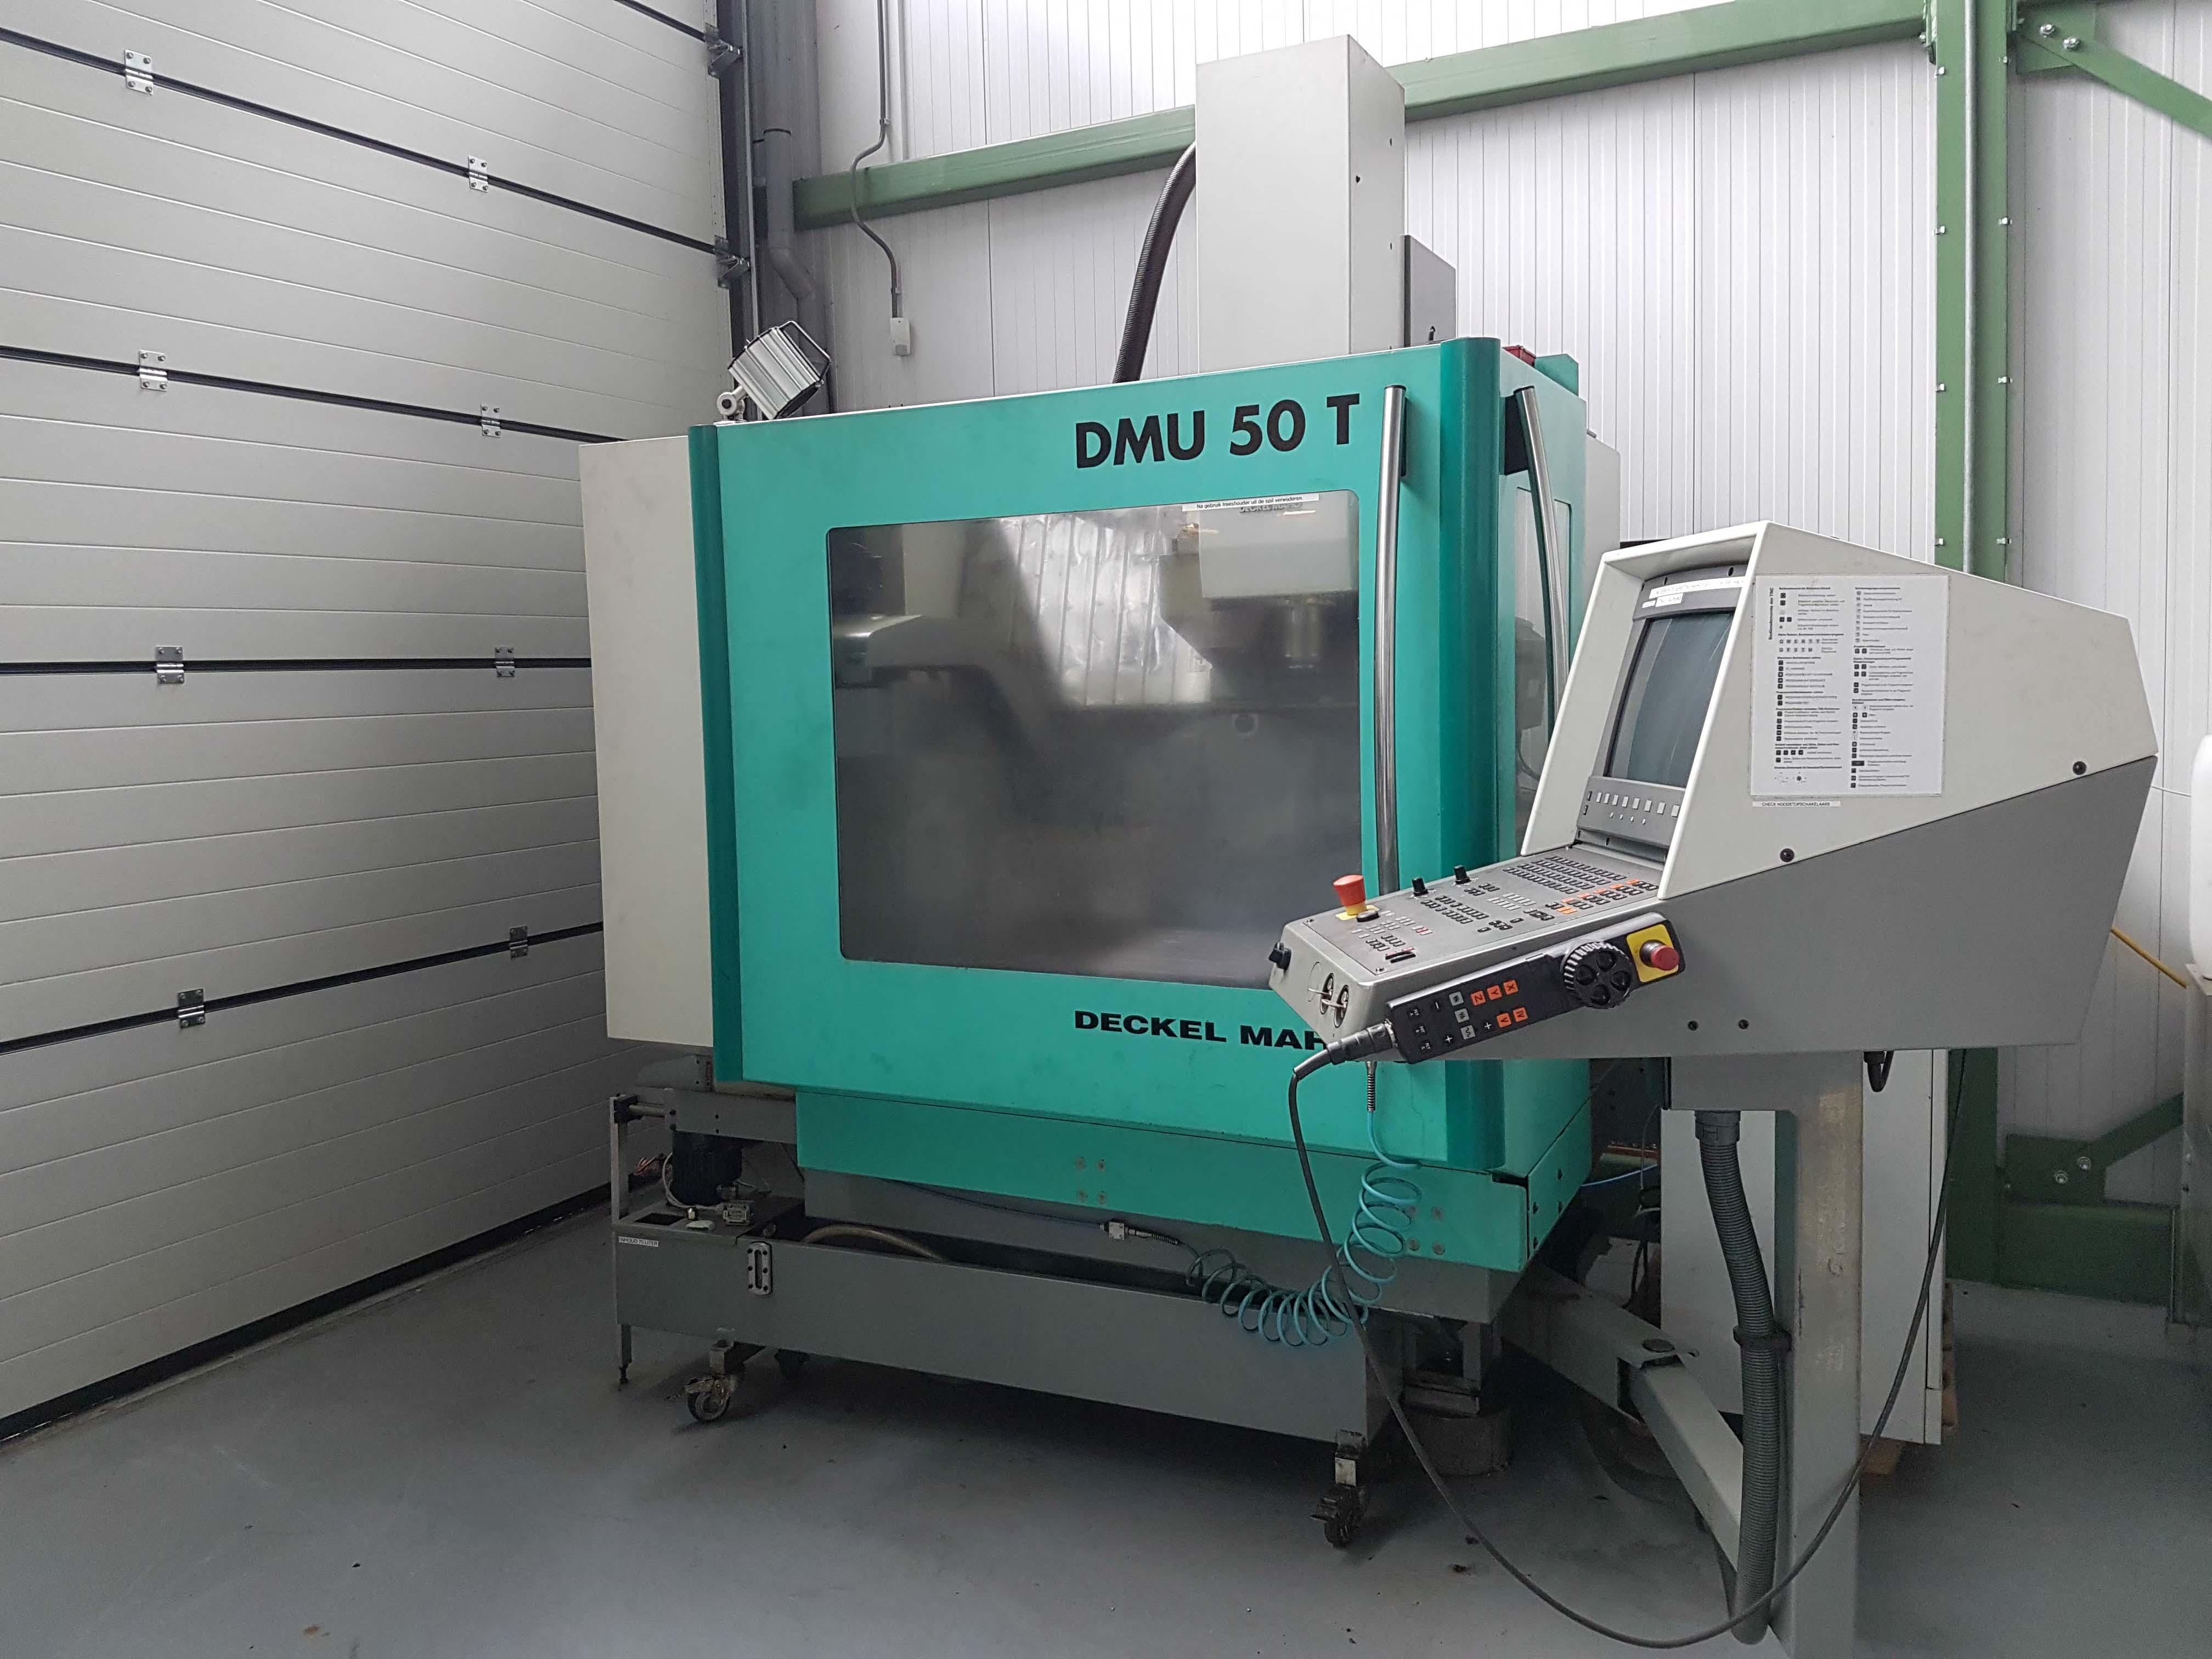 deckel maho dmu 50 t cnc machining center exapro